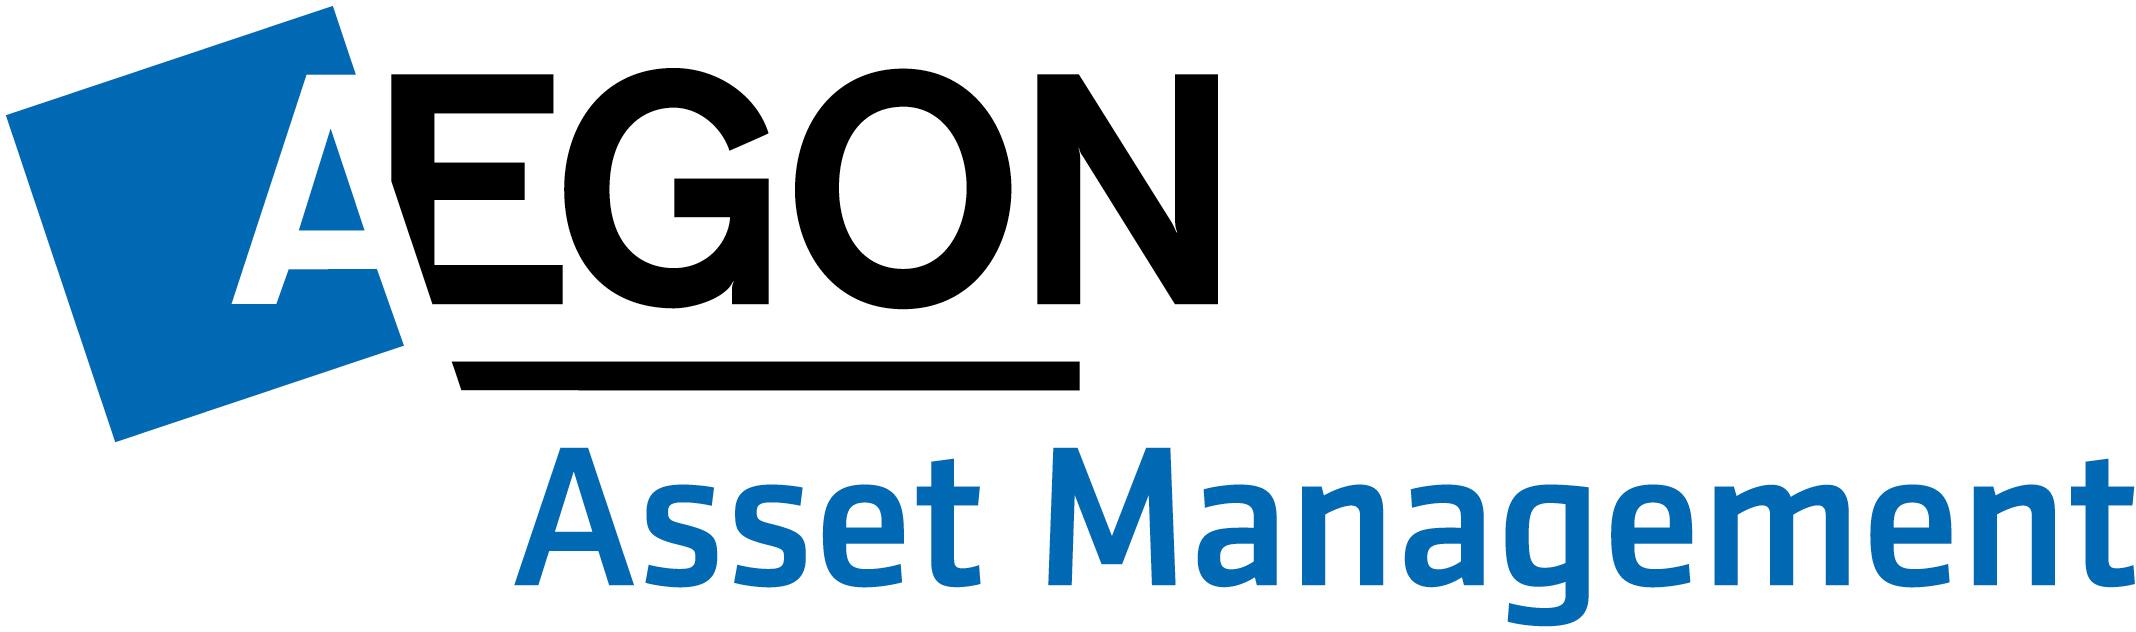 Aegon_Asset_Management